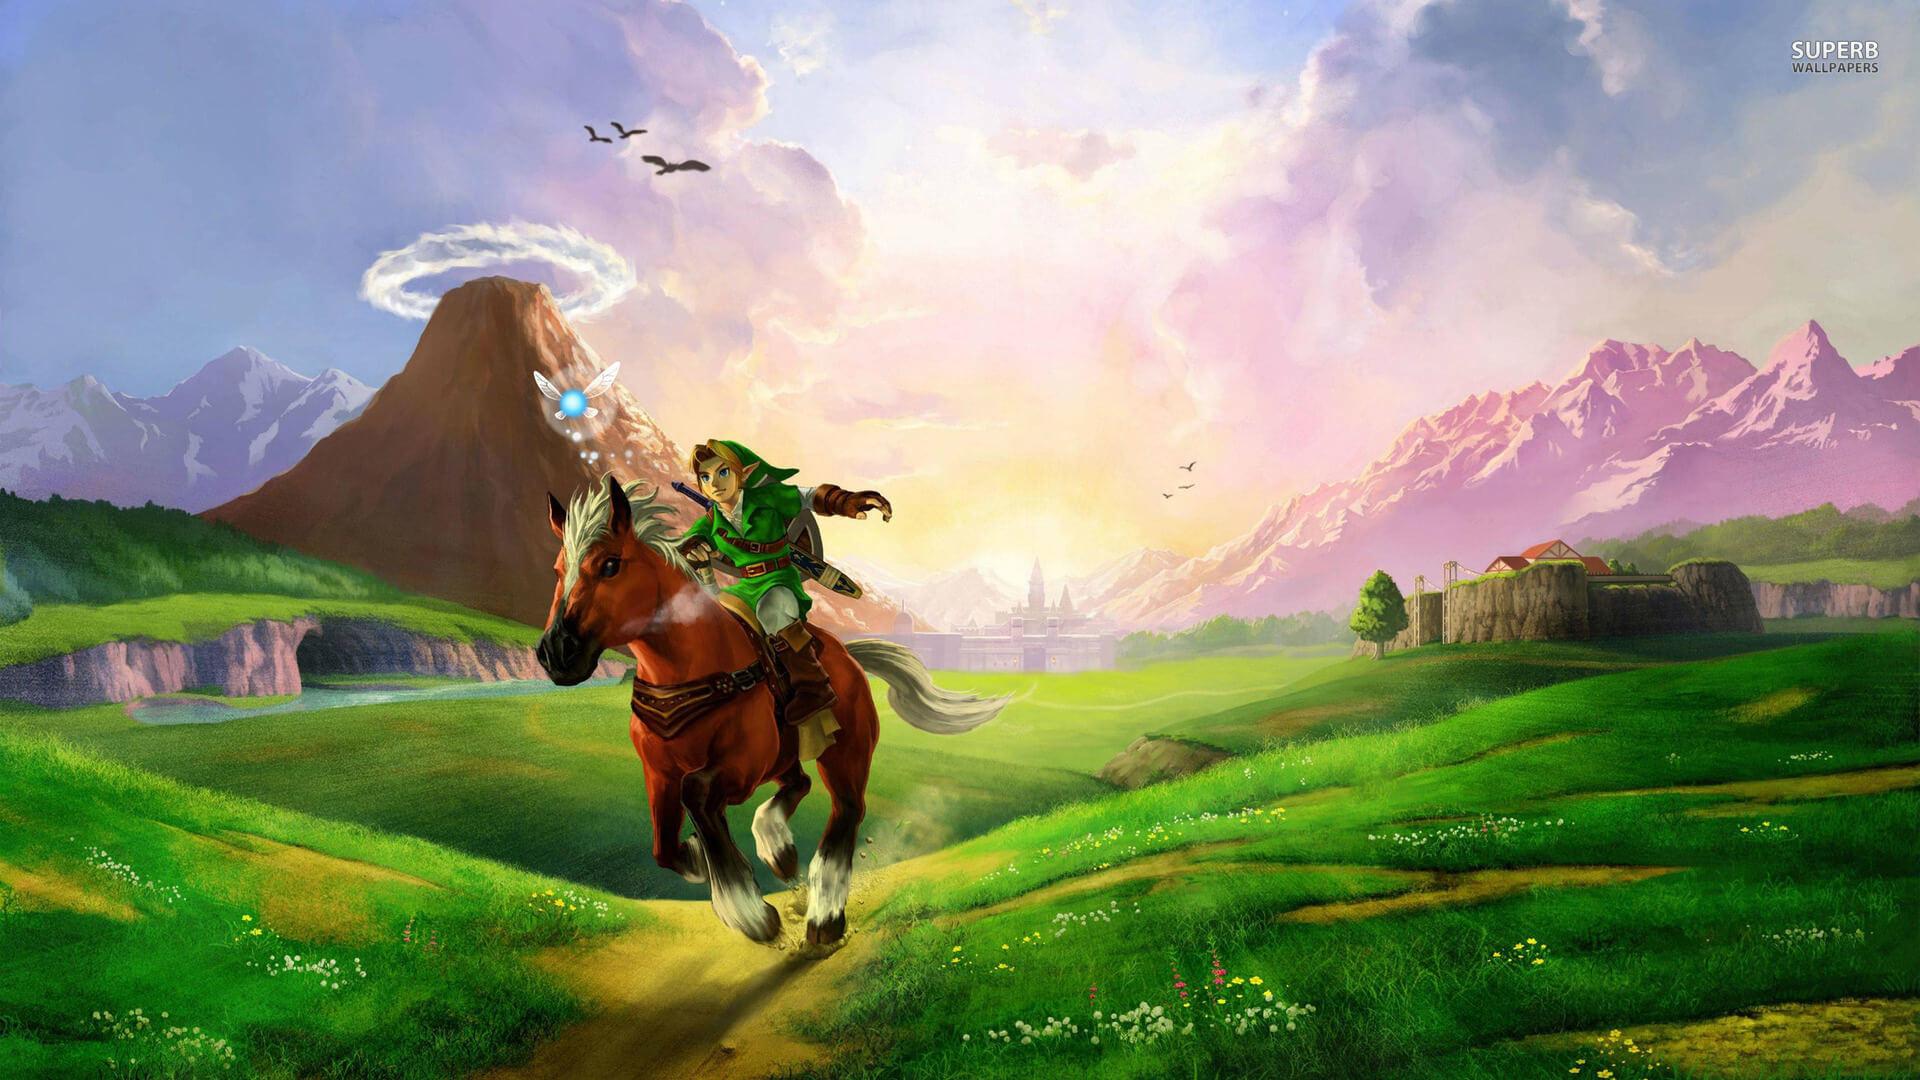 Legend Of Zelda Ocarina Of Time Wallpaper Free